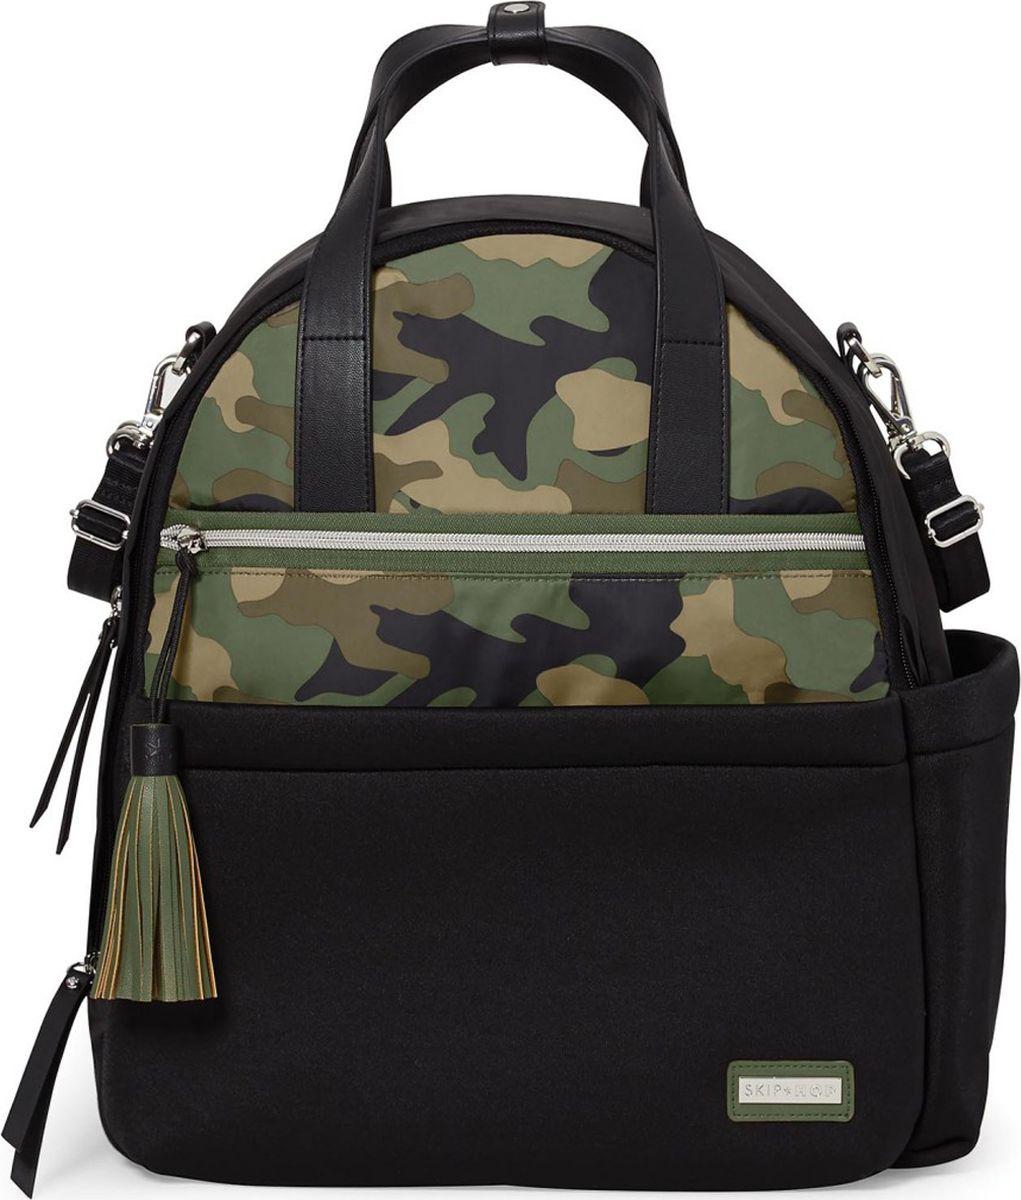 Skip Hop Рюкзак для мамы Nolita Neoprene Diaper Backpack цвет черный зеленый SH 204303